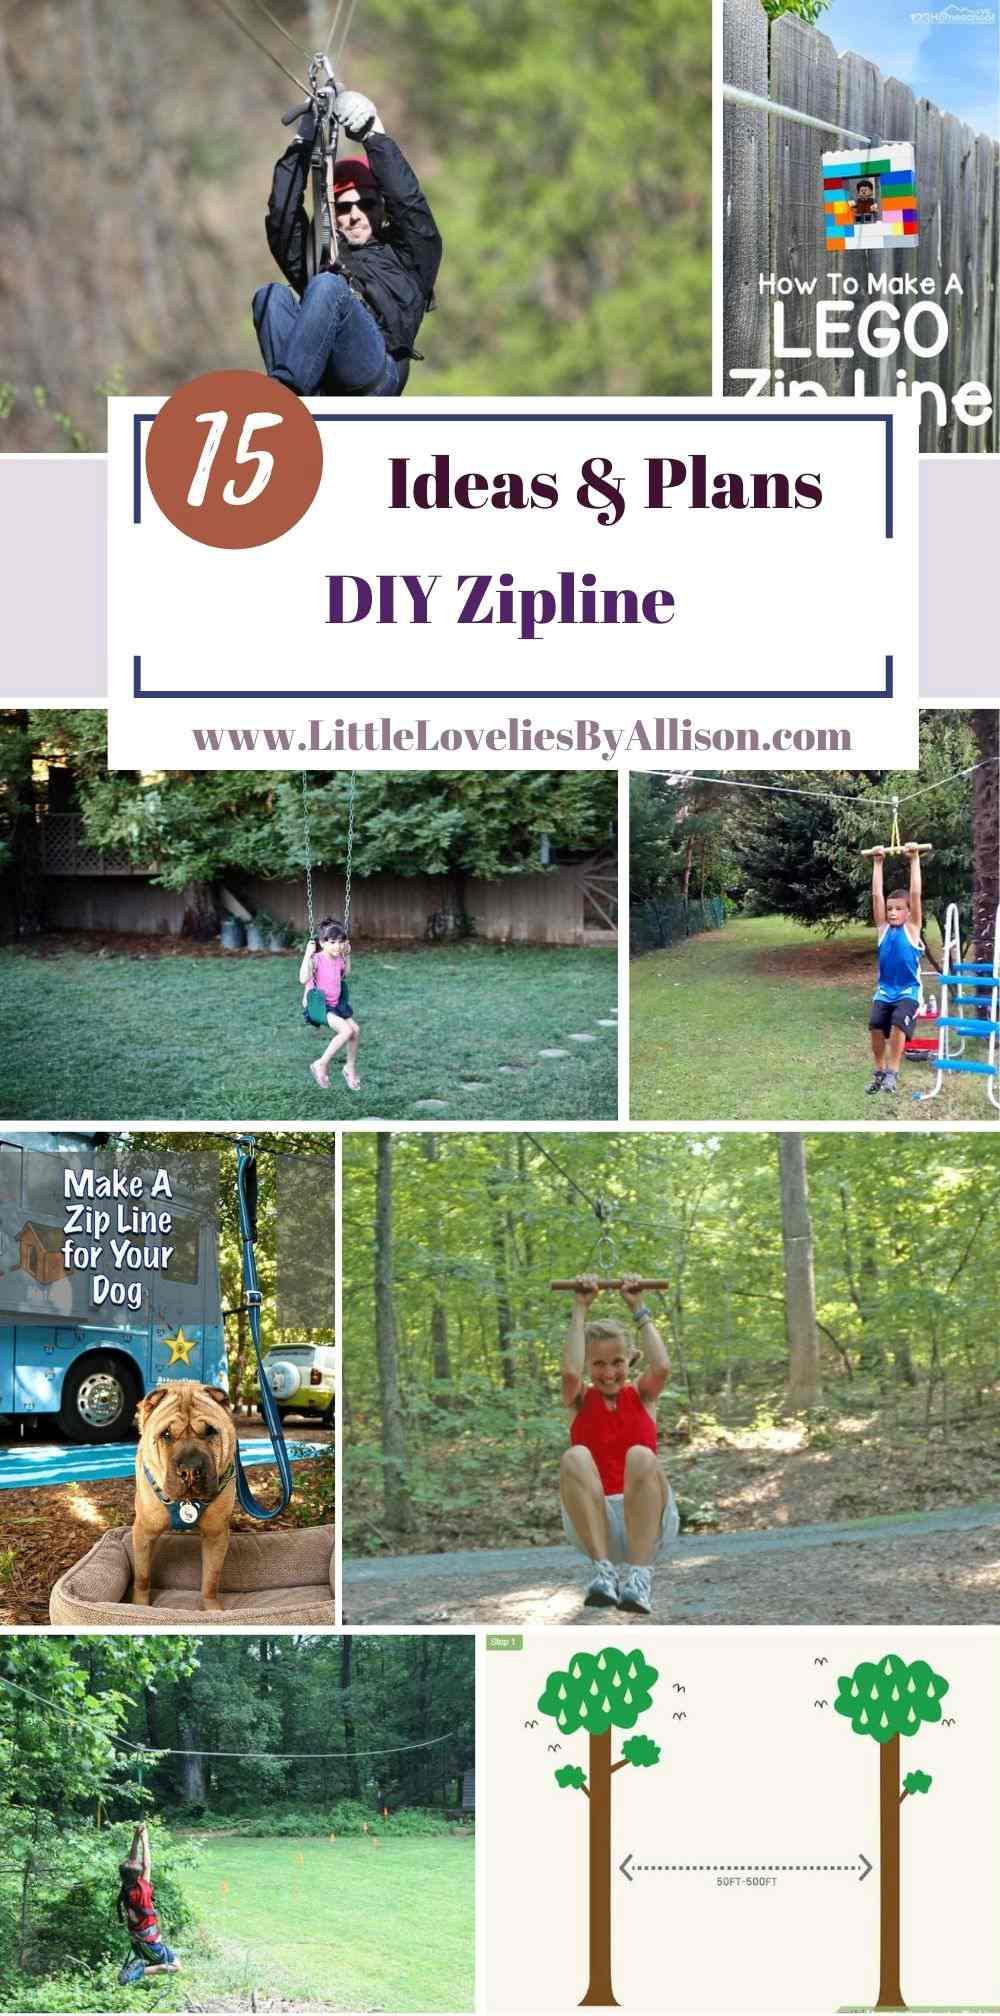 15 DIY Zipline Ideas within Reasonable Cost